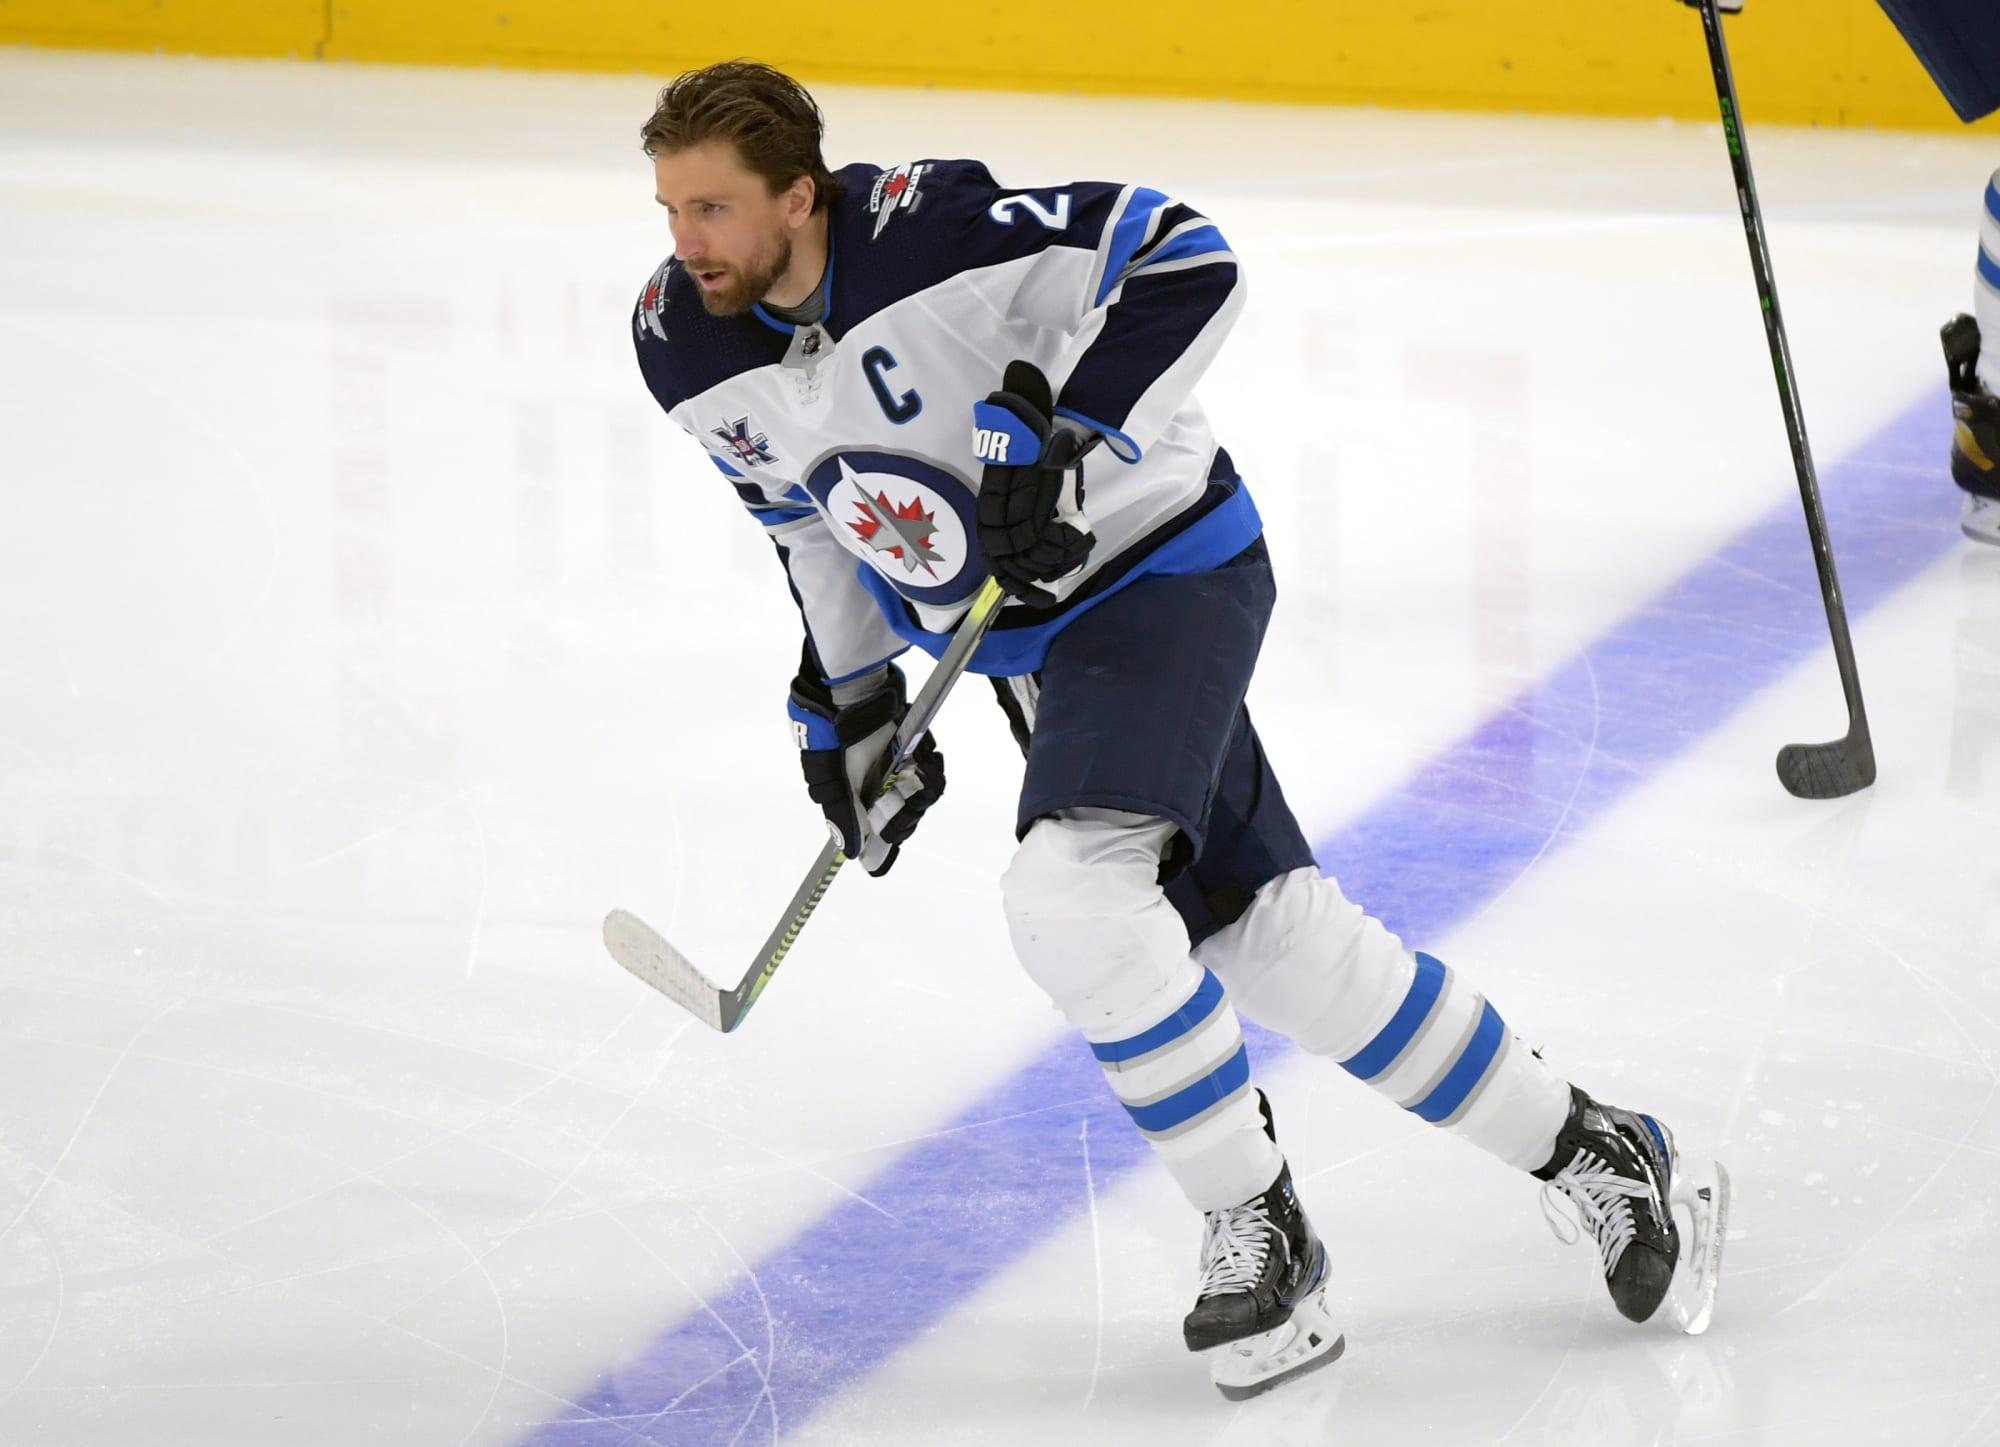 Winnipeg Jets: Blake Wheeler Returns to the Ice in Winnipeg